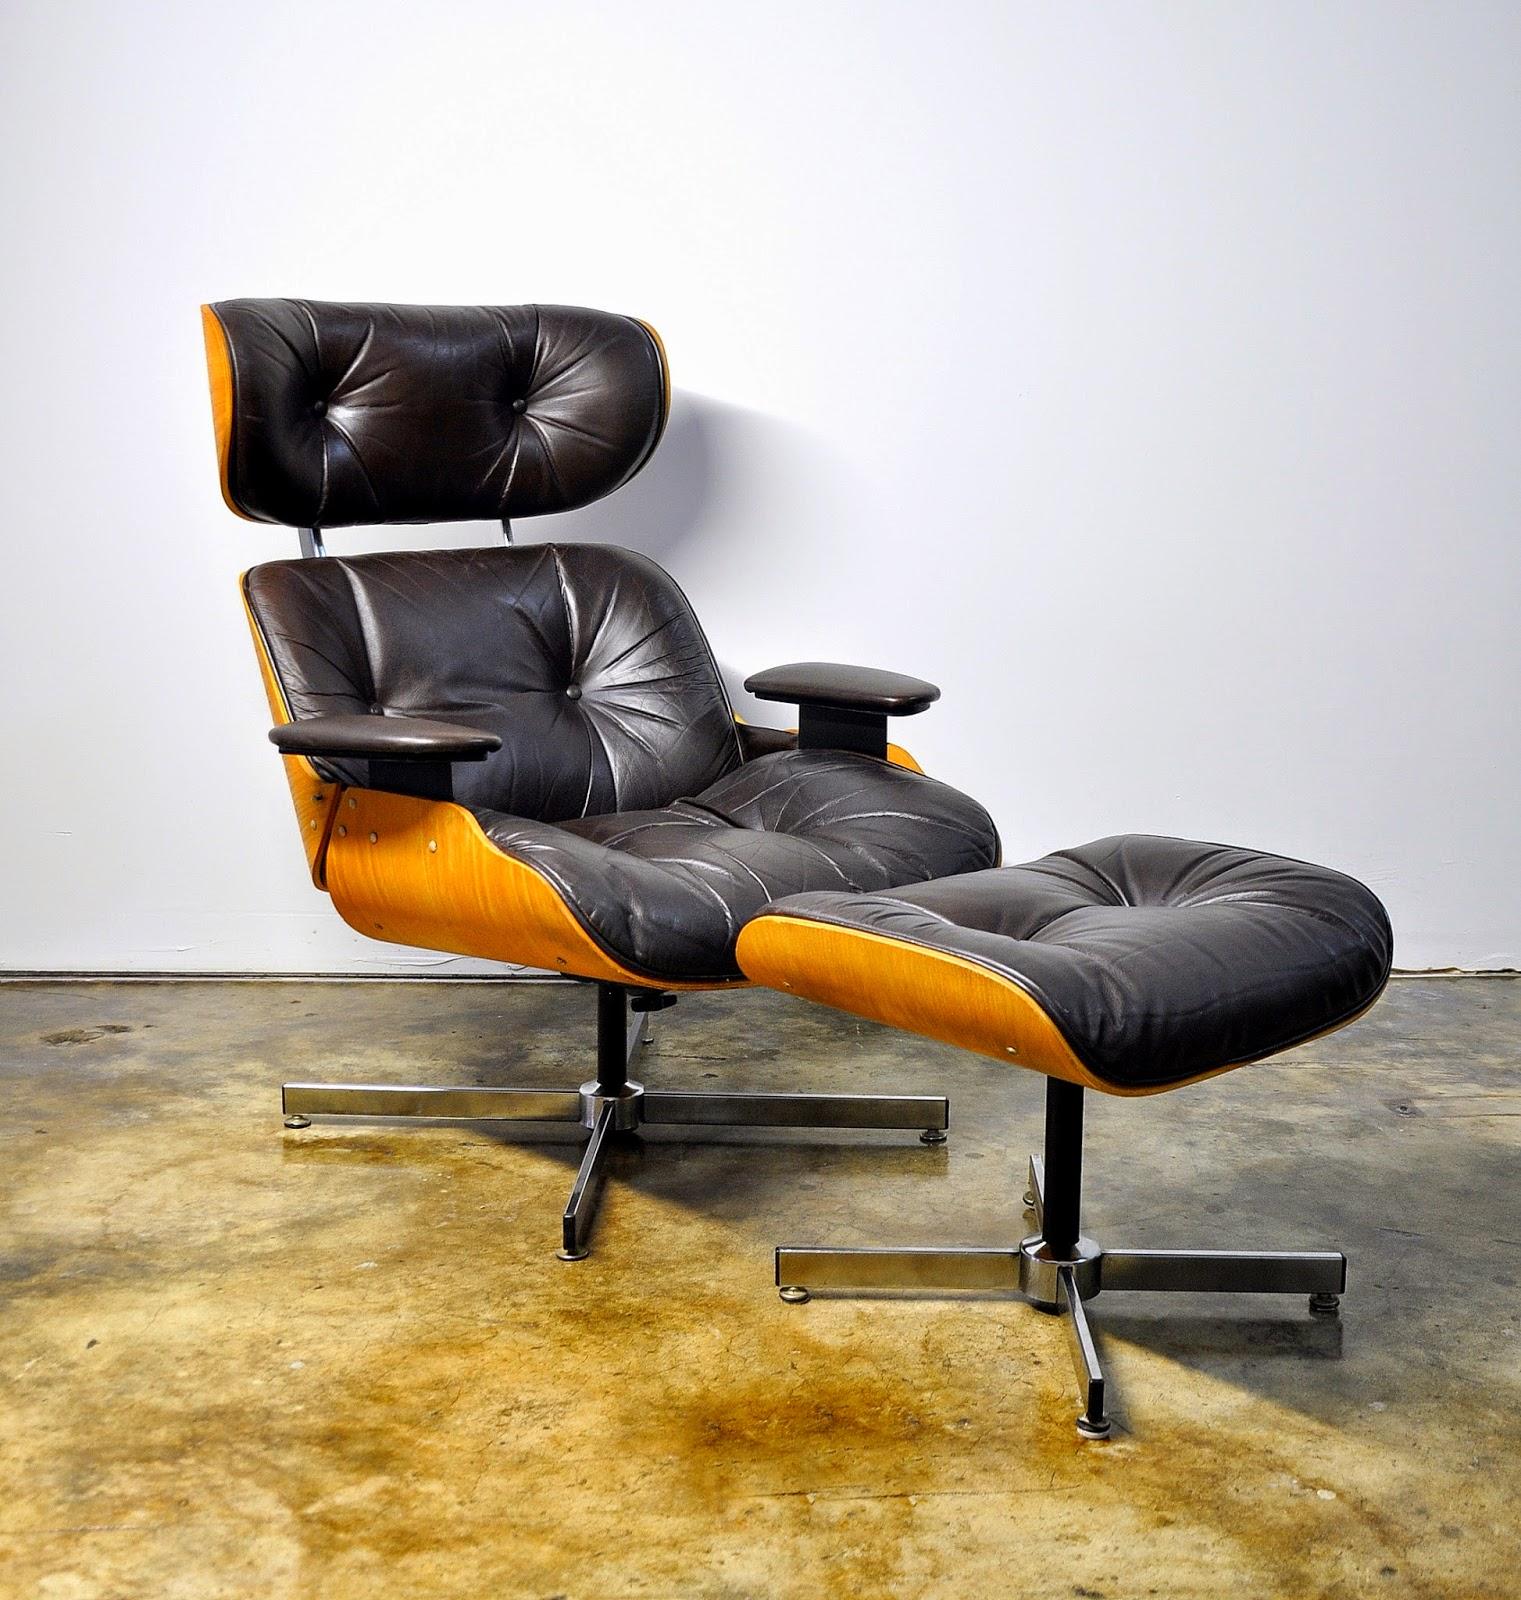 eames leather lounge chair u0026 ottoman - Eames Lounge Chair And Ottoman